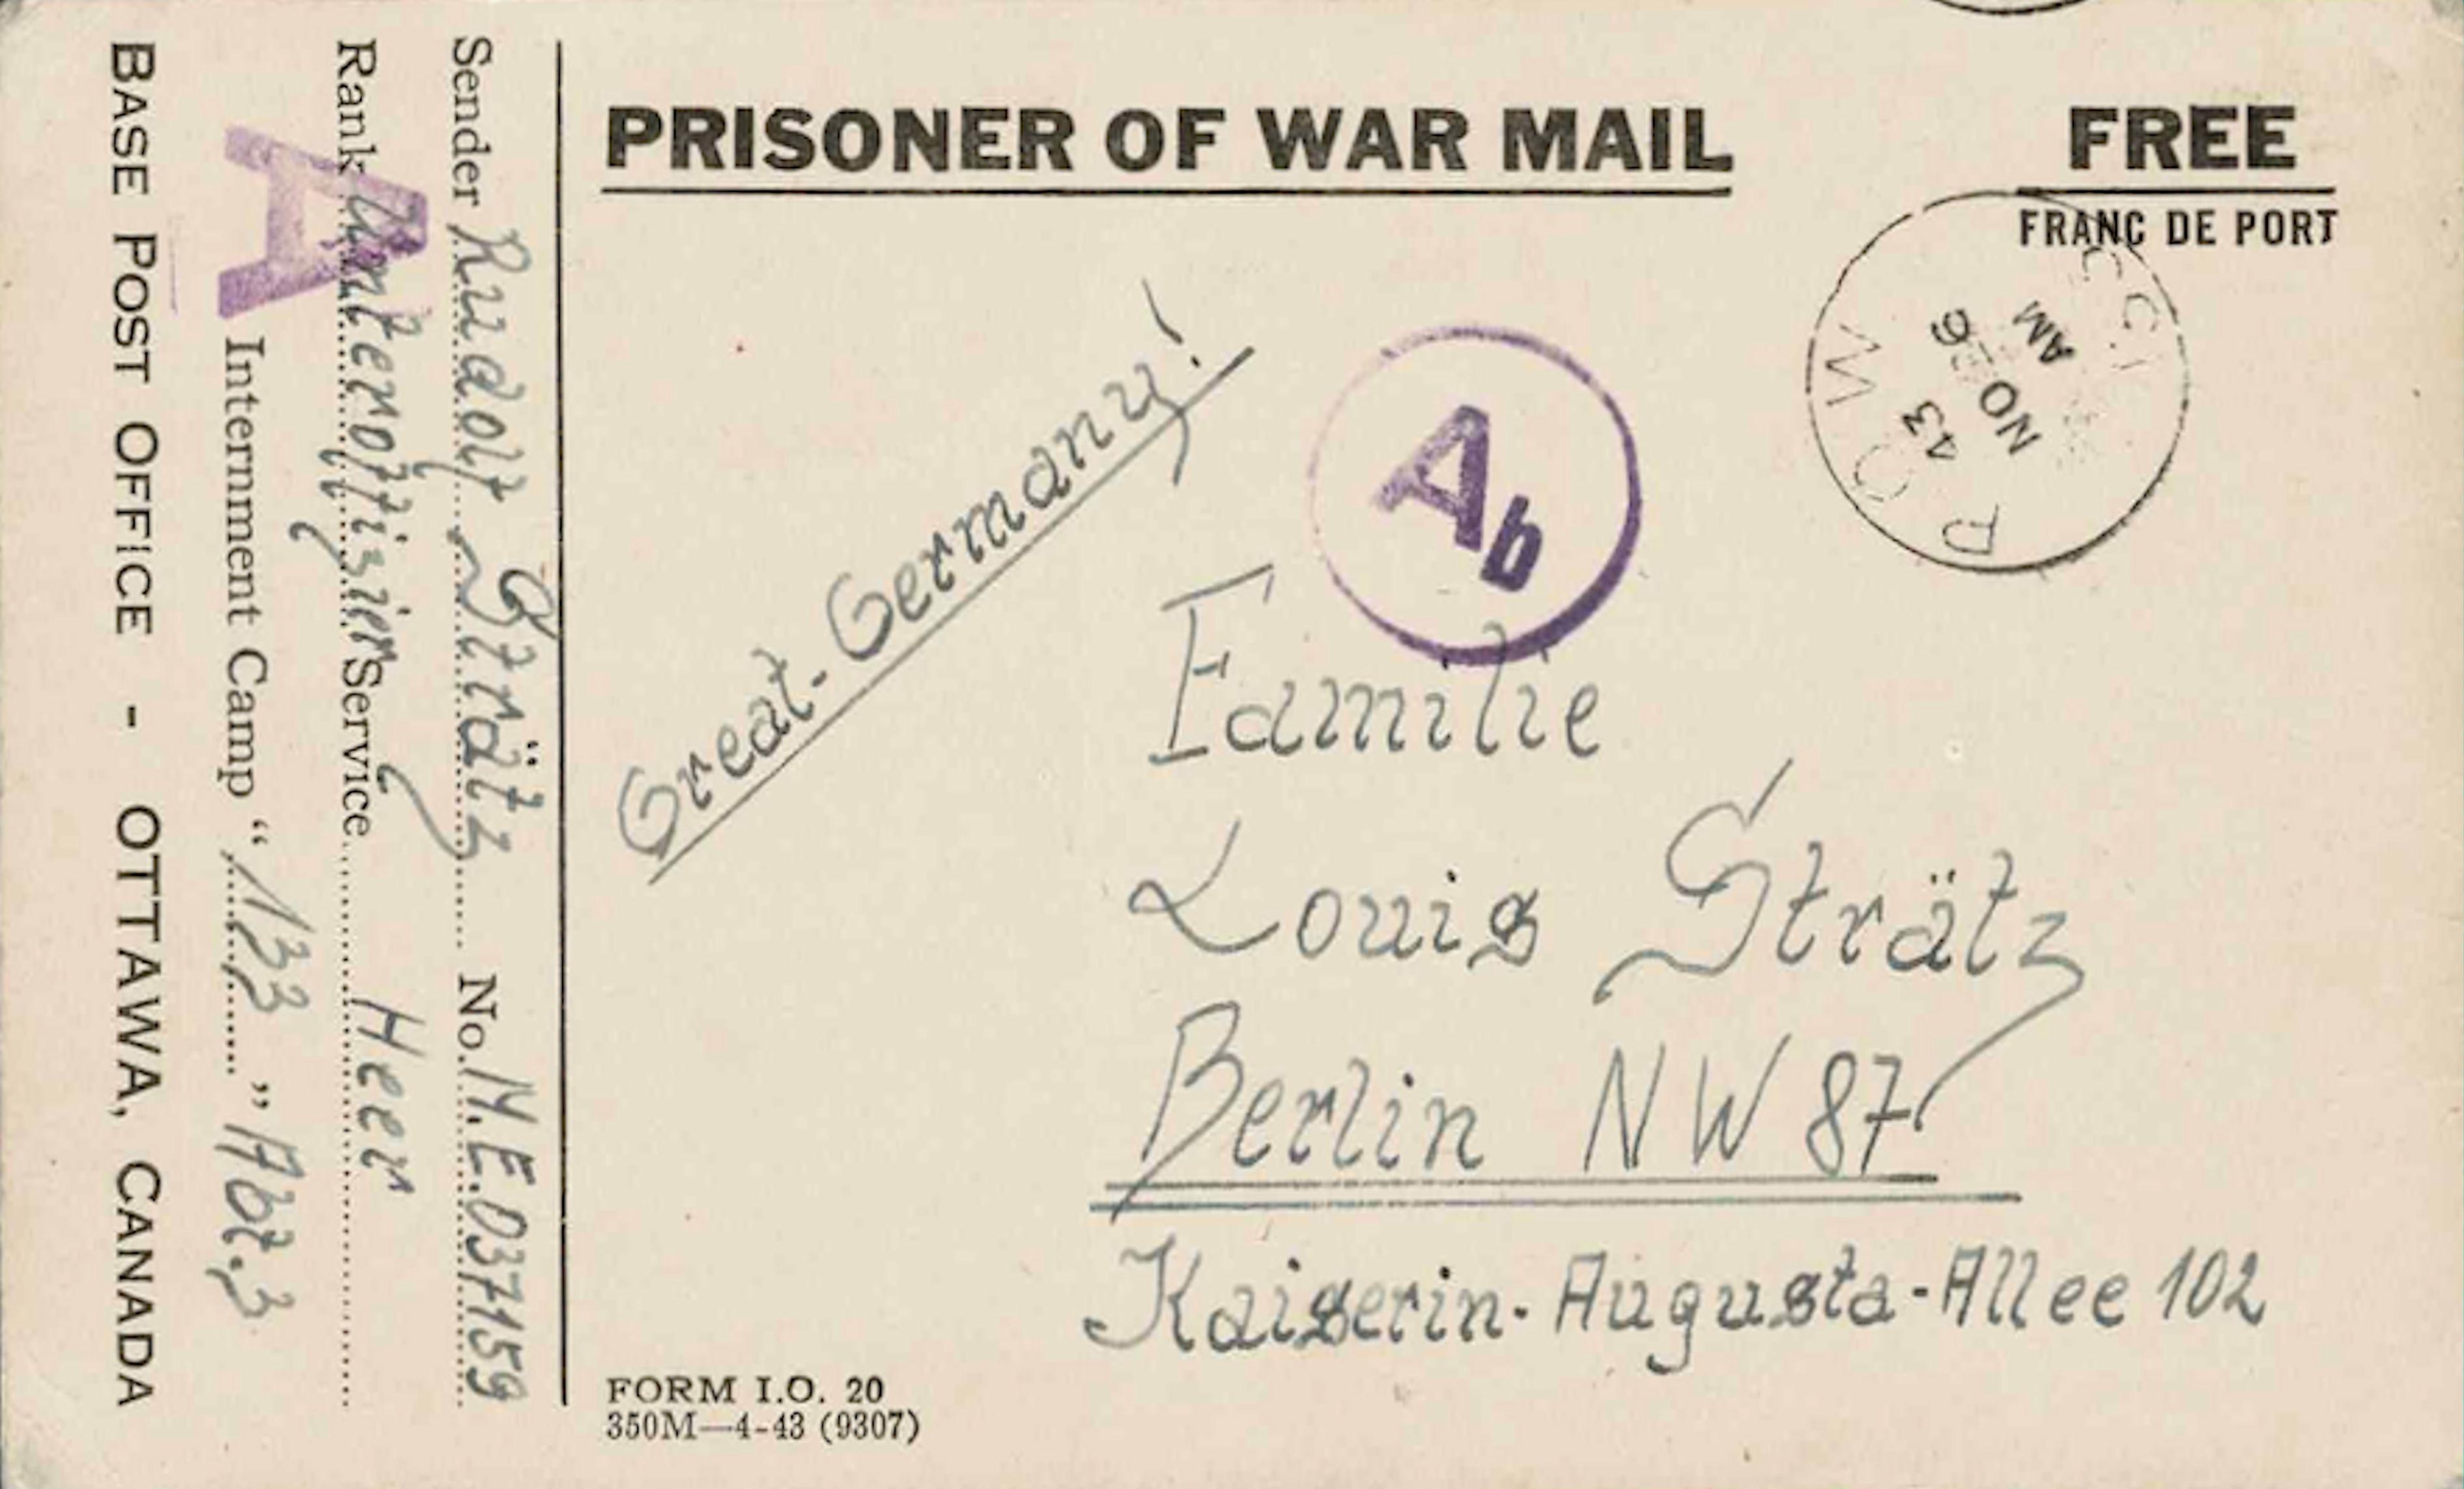 1943;Canada;The War Prisoners Aid of the YMCA ; WW II-Era Christmas POW Card